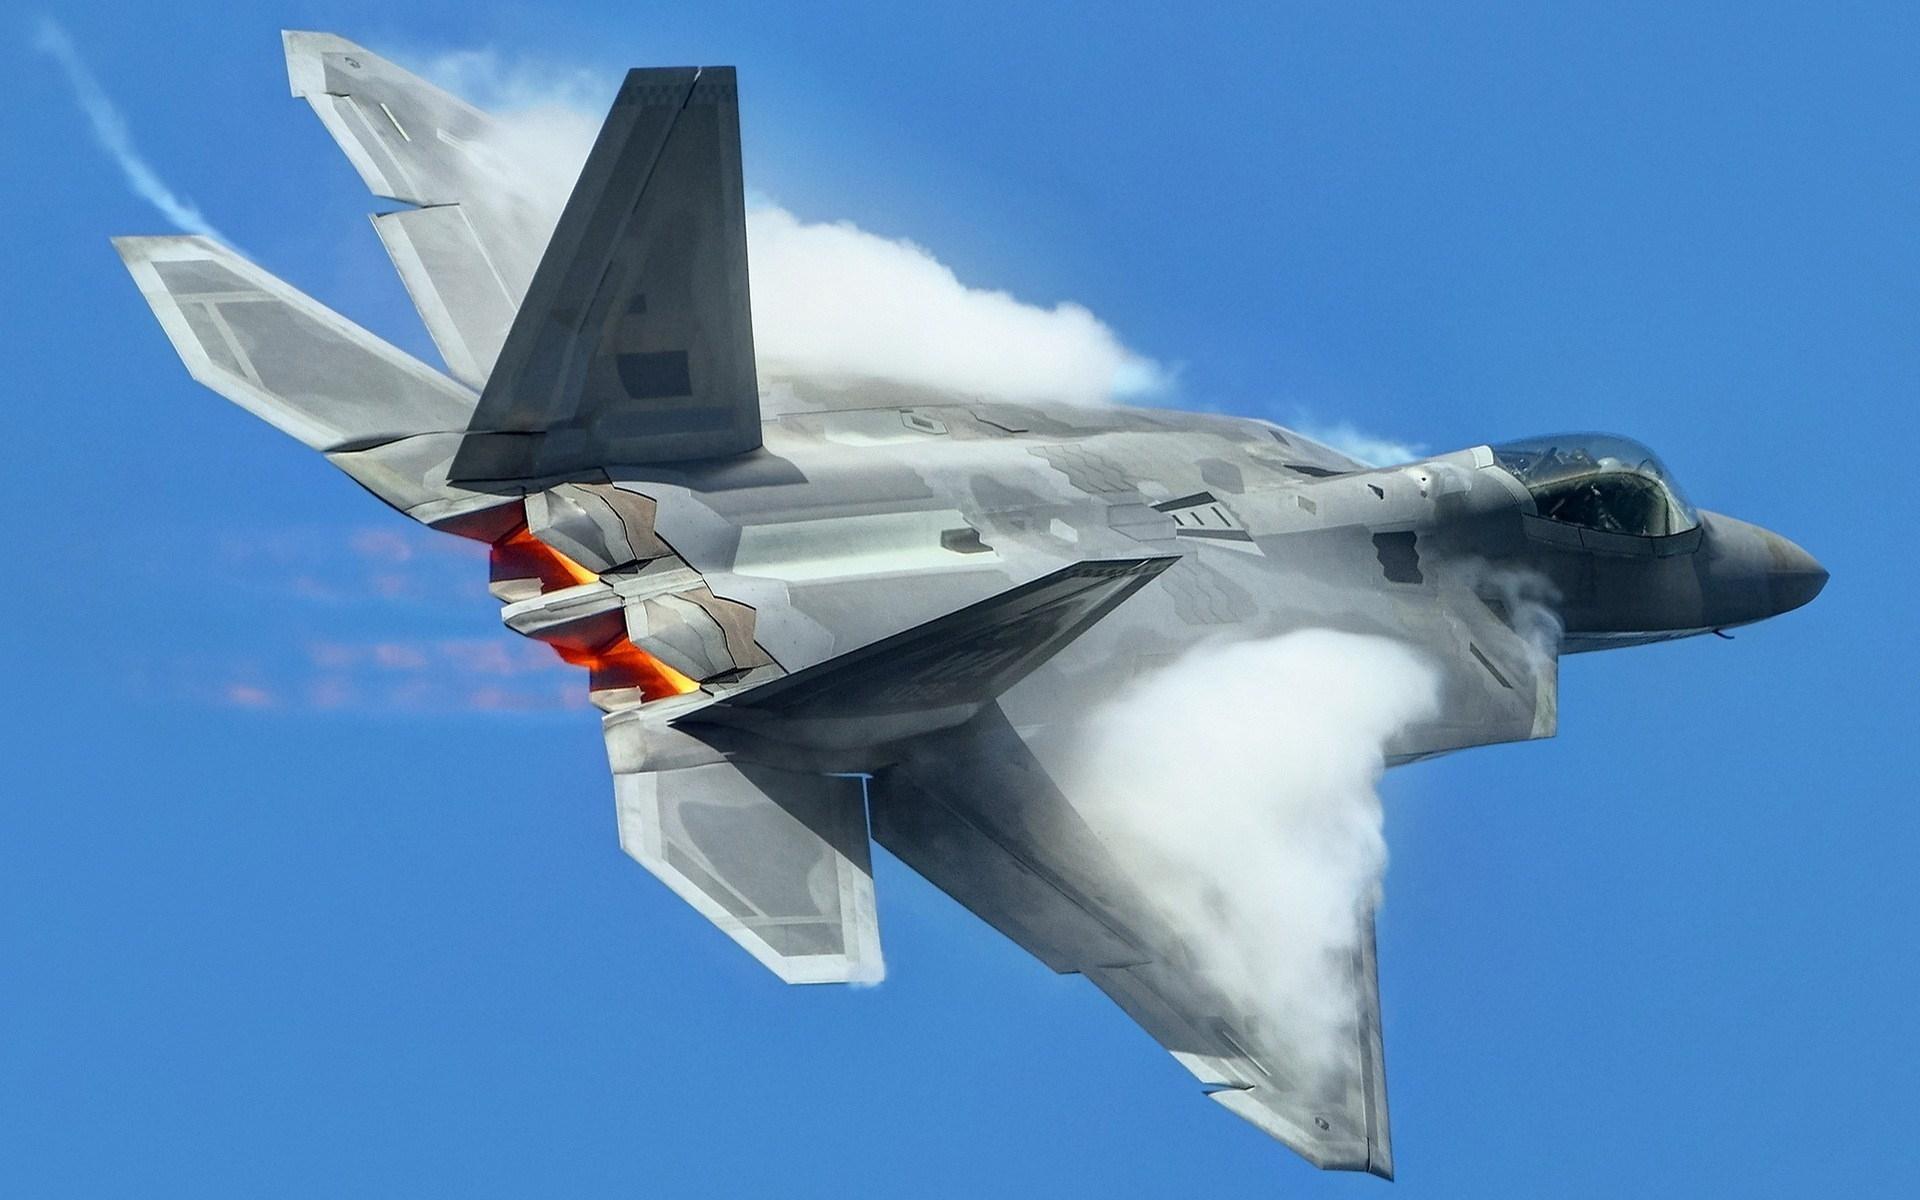 lockheed martin corporation may resume production of f 22 aircraft